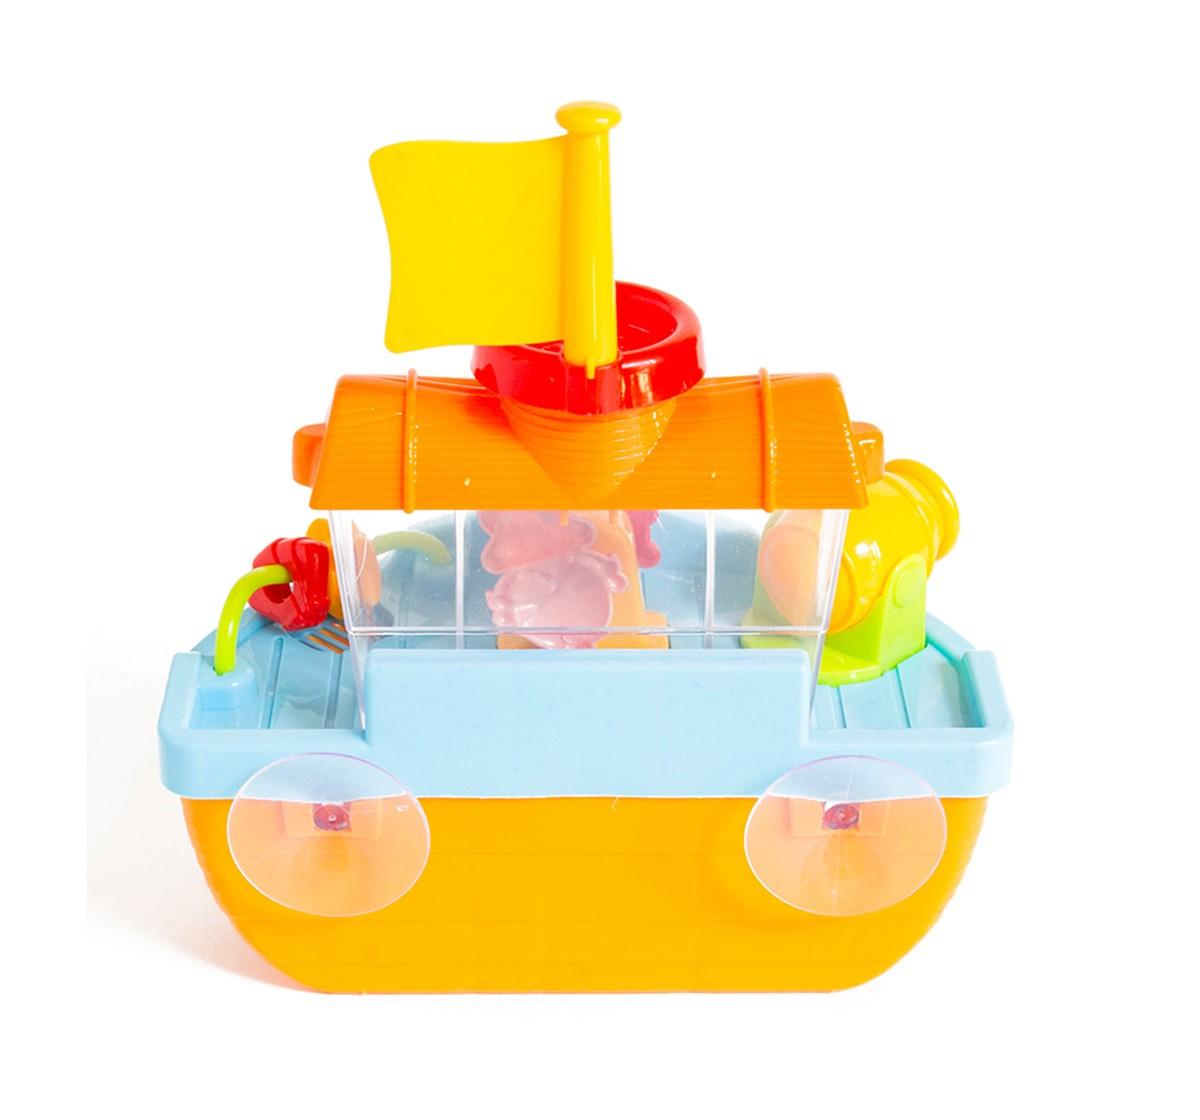 Hamleys Pirate Bath Set Bath Toys & Accessories for Kids age 6M+